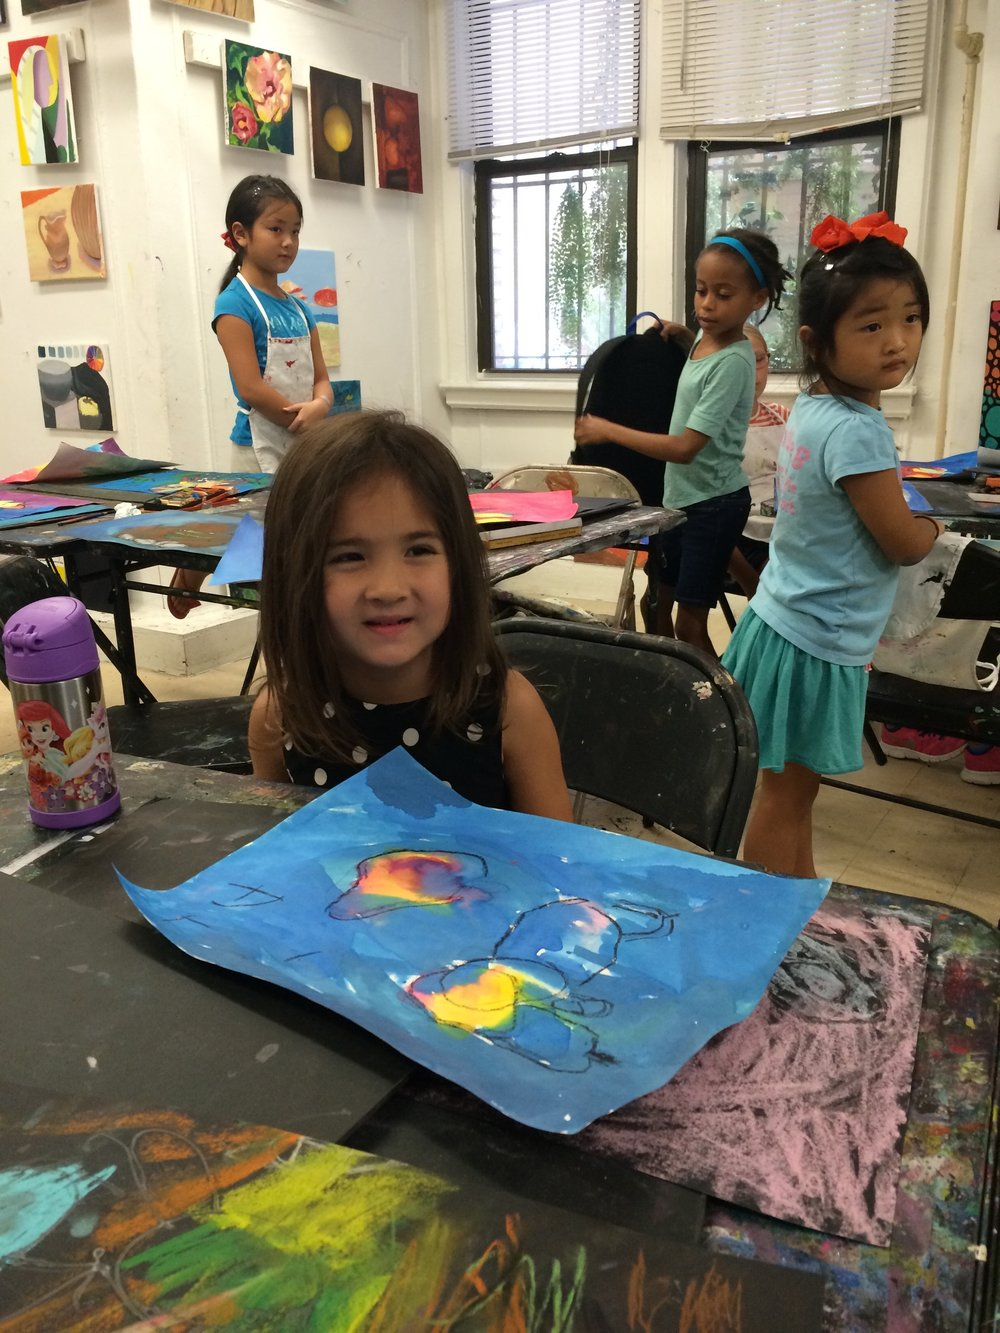 Student making art